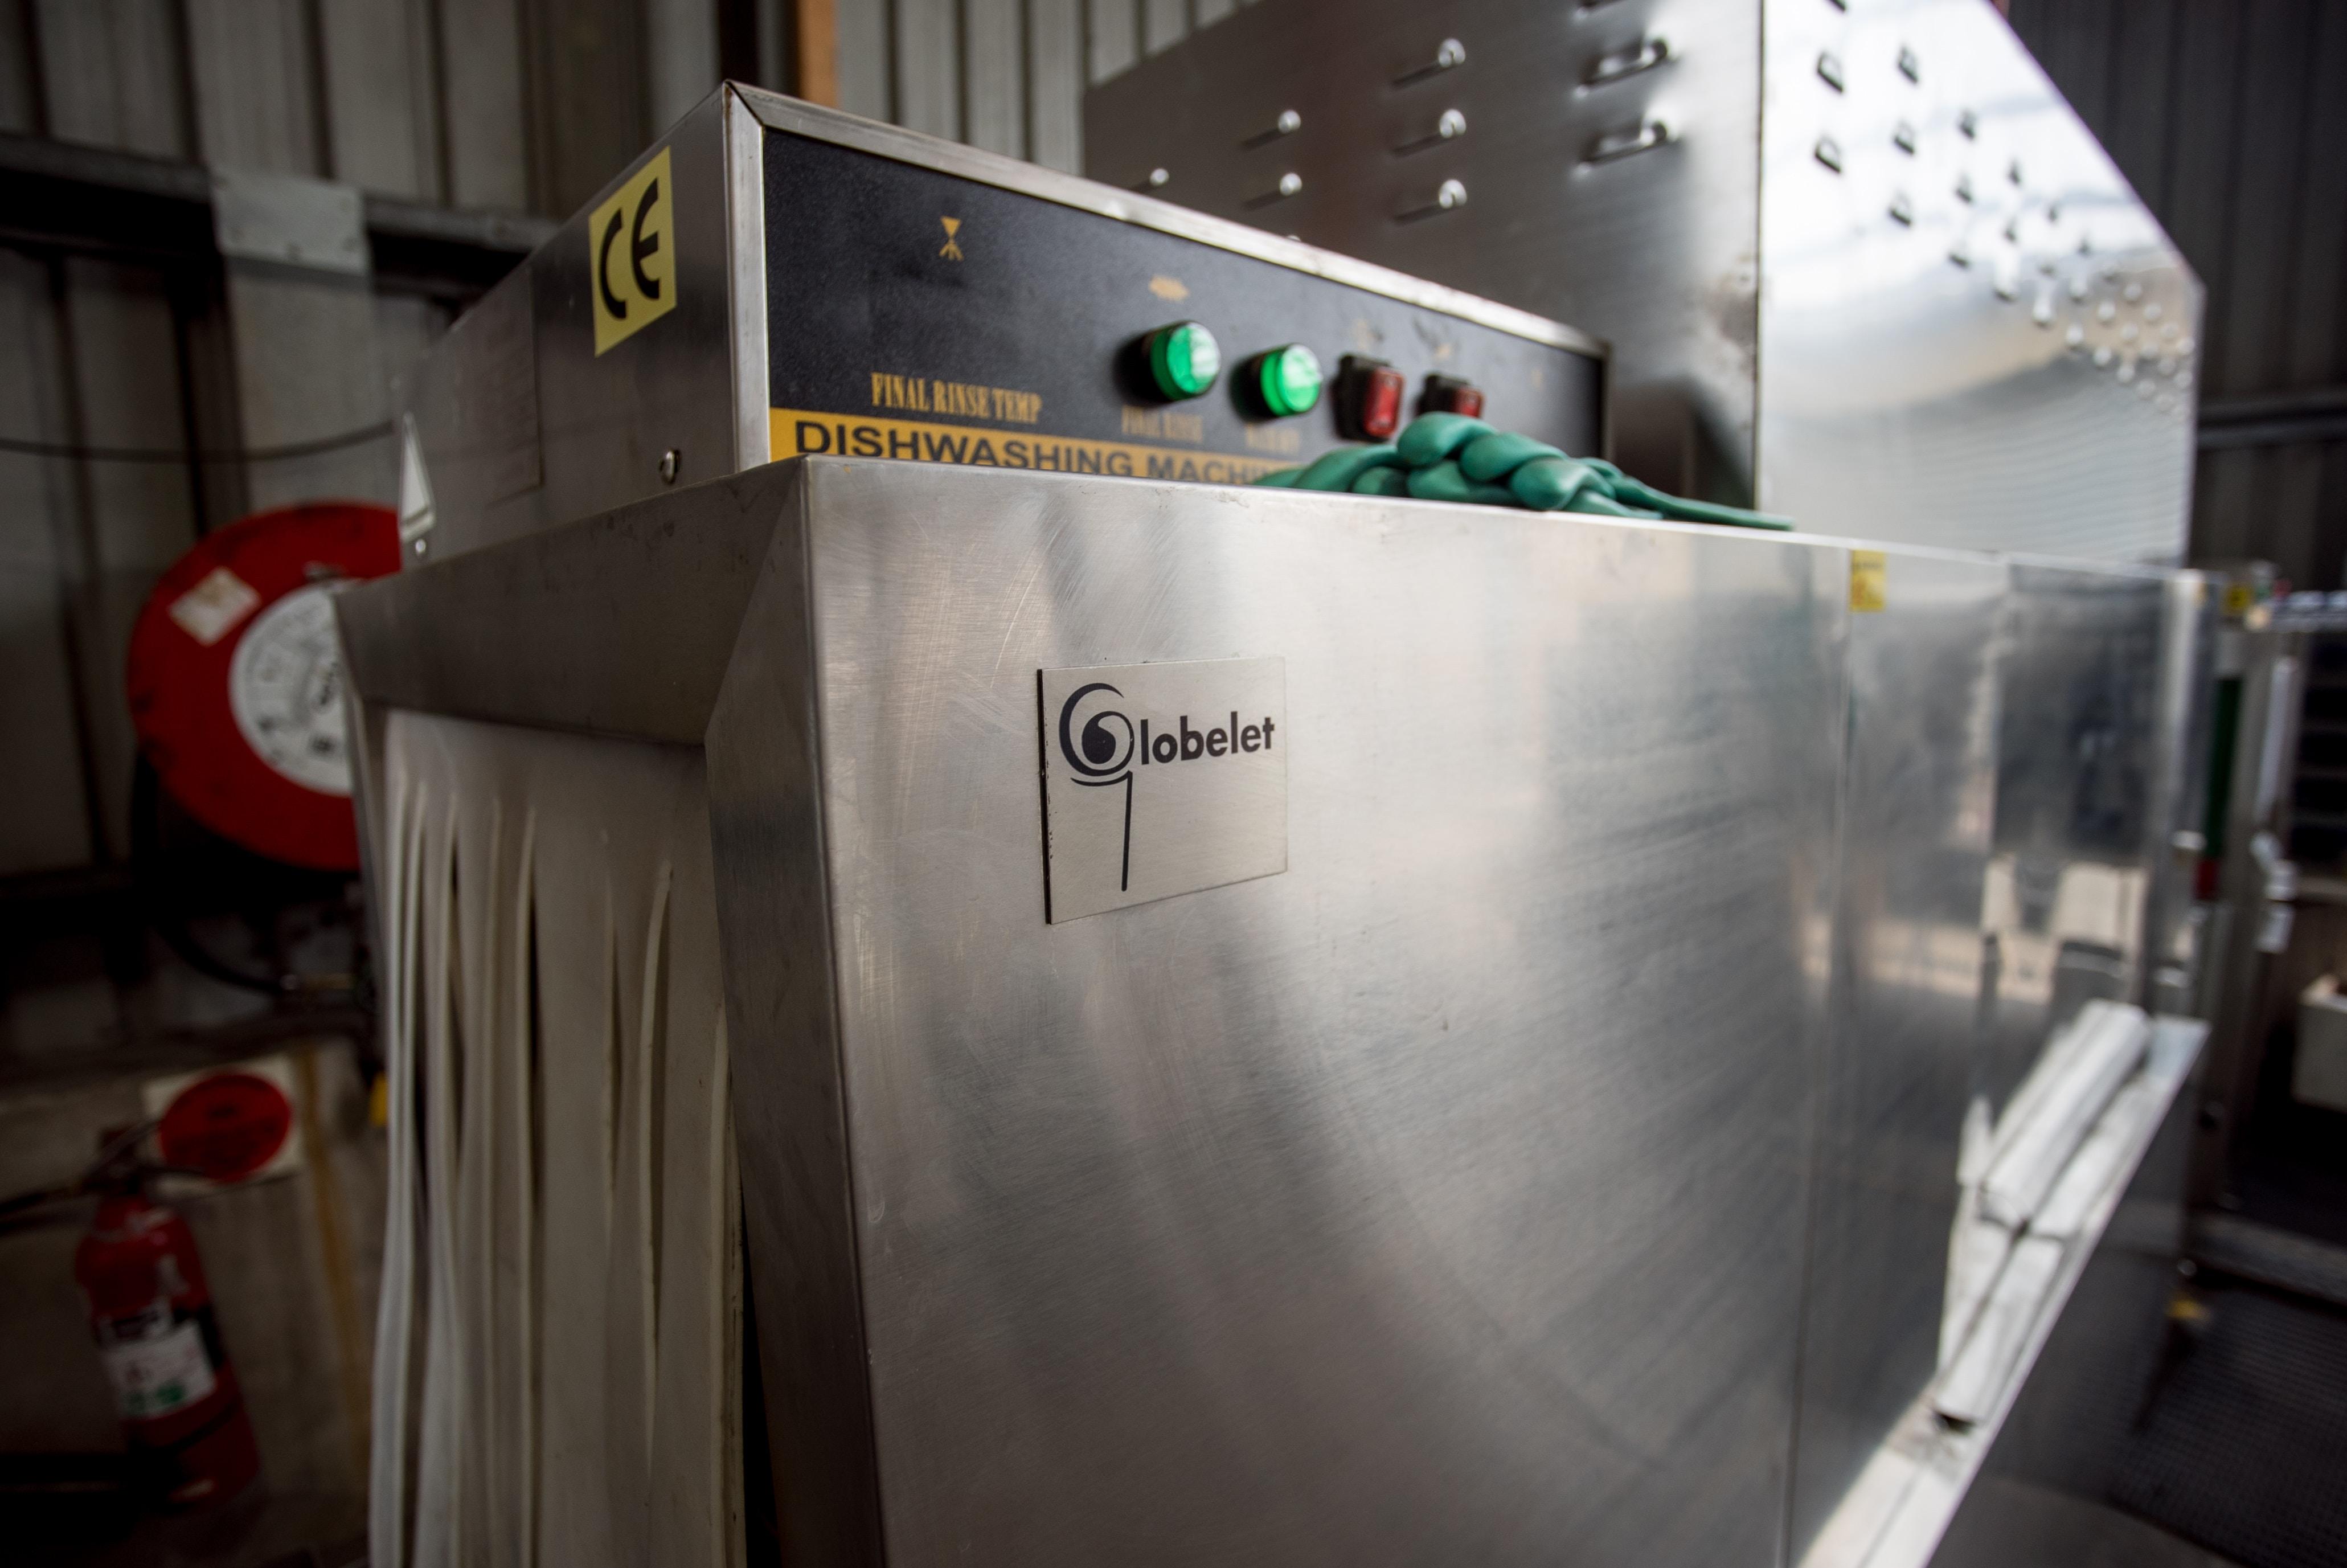 gray Lobelet dishwashing machine